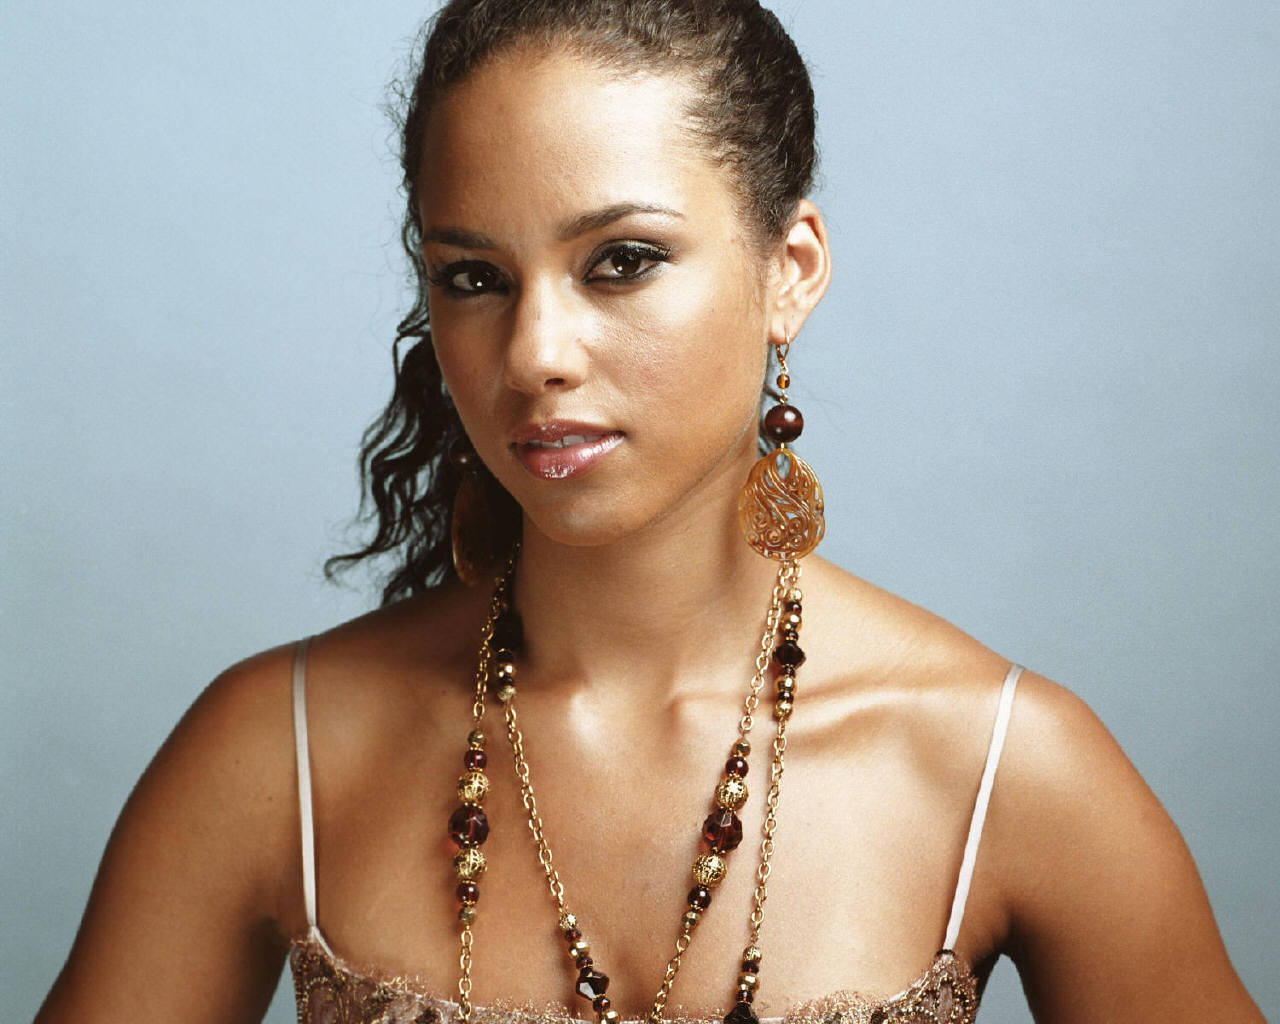 http://4.bp.blogspot.com/-ML0OuZjyjm4/TzRQhTIvVBI/AAAAAAAAAzc/jfFHIK38fF8/s1600/Alicia+Keys+hot+looks+%281%29.jpg